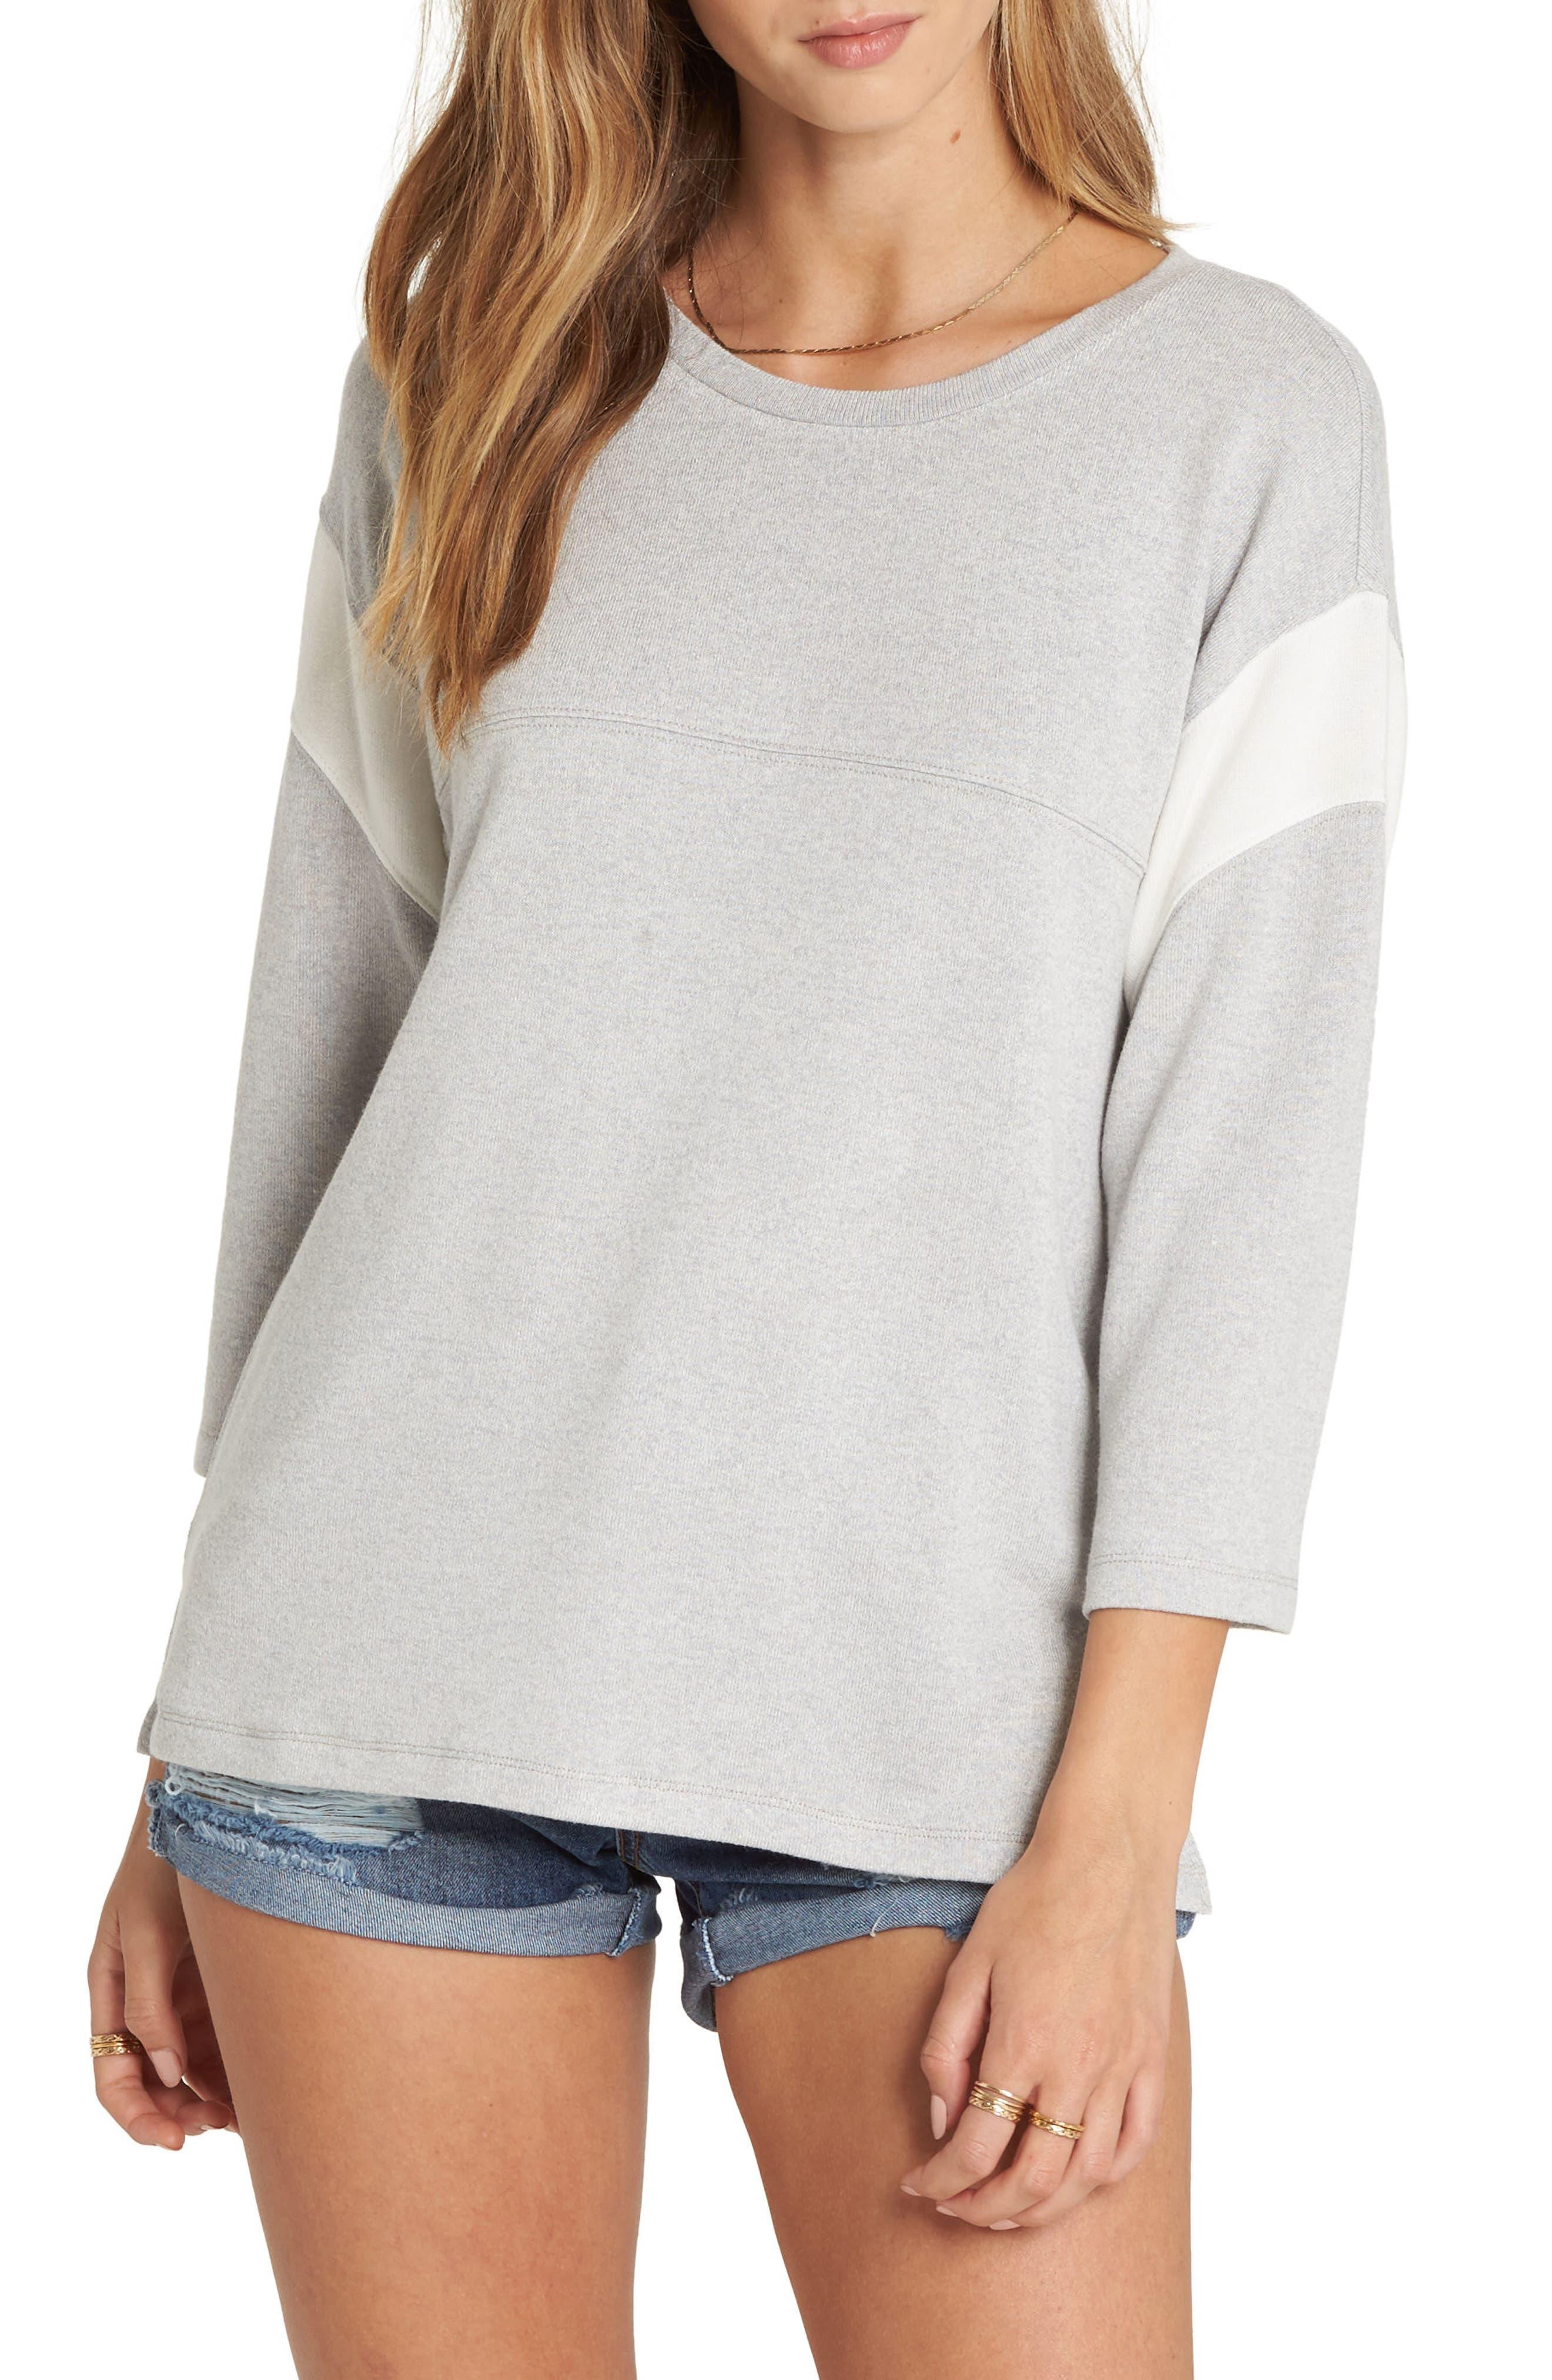 Kicking Game Sweatshirt,                         Main,                         color, Ice Athletic Grey